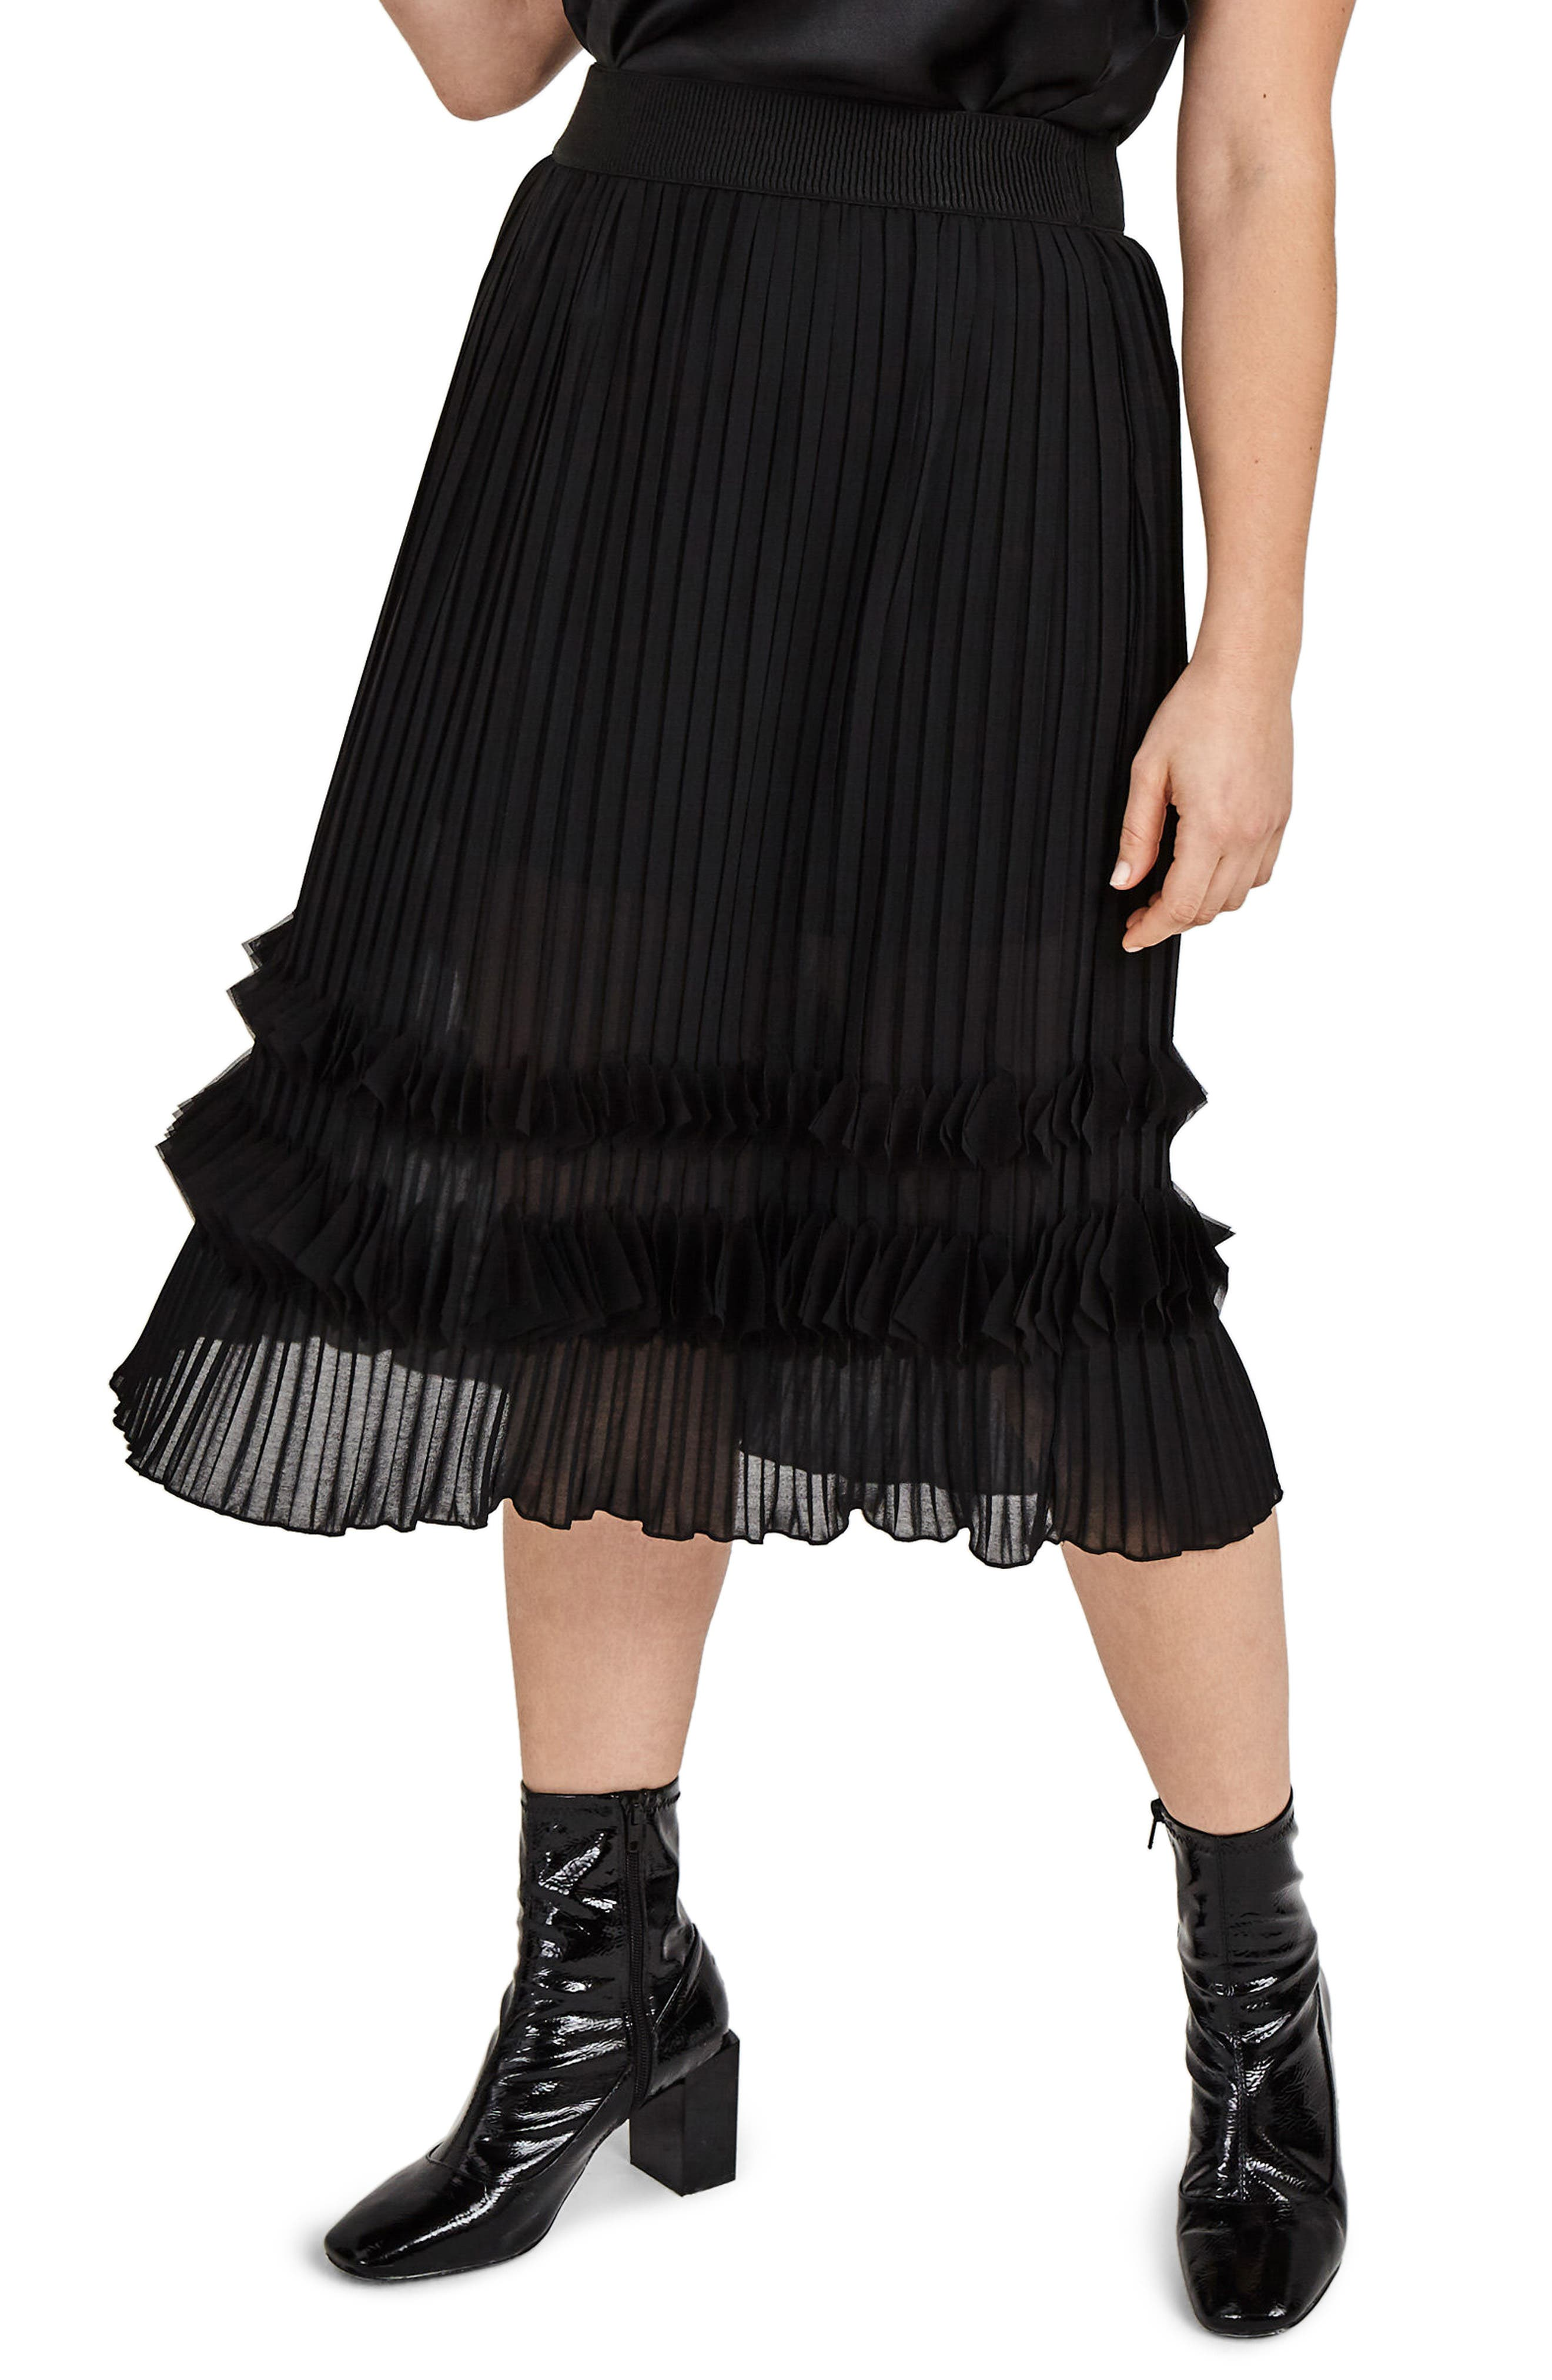 Plus Size Black Skirts